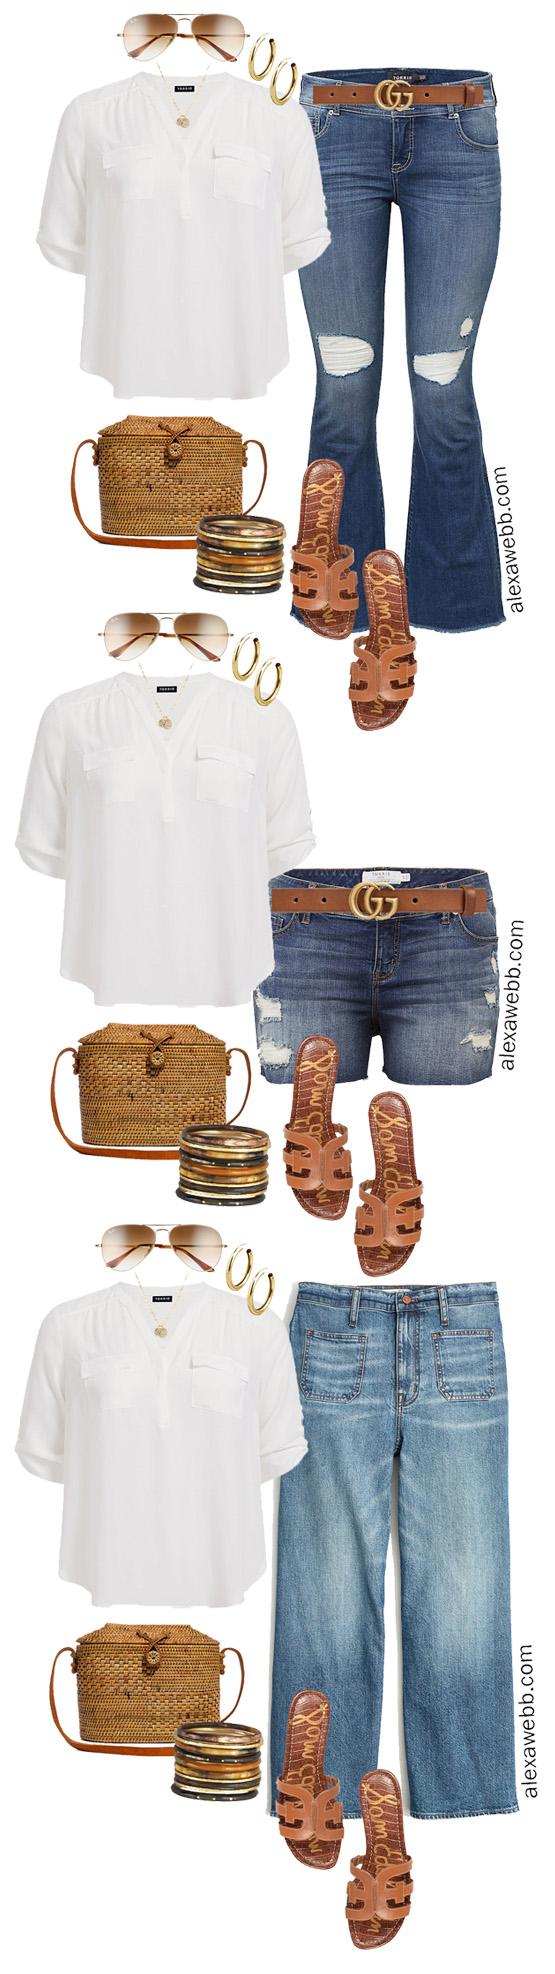 Plus Size Summer Jeans Outfit Ideas- Denim Kick Flares, Shorts, and Cropped Wide Leg Jeans - Plus Size Fashion for Women - alexawebb.com #plussize #alexawebb